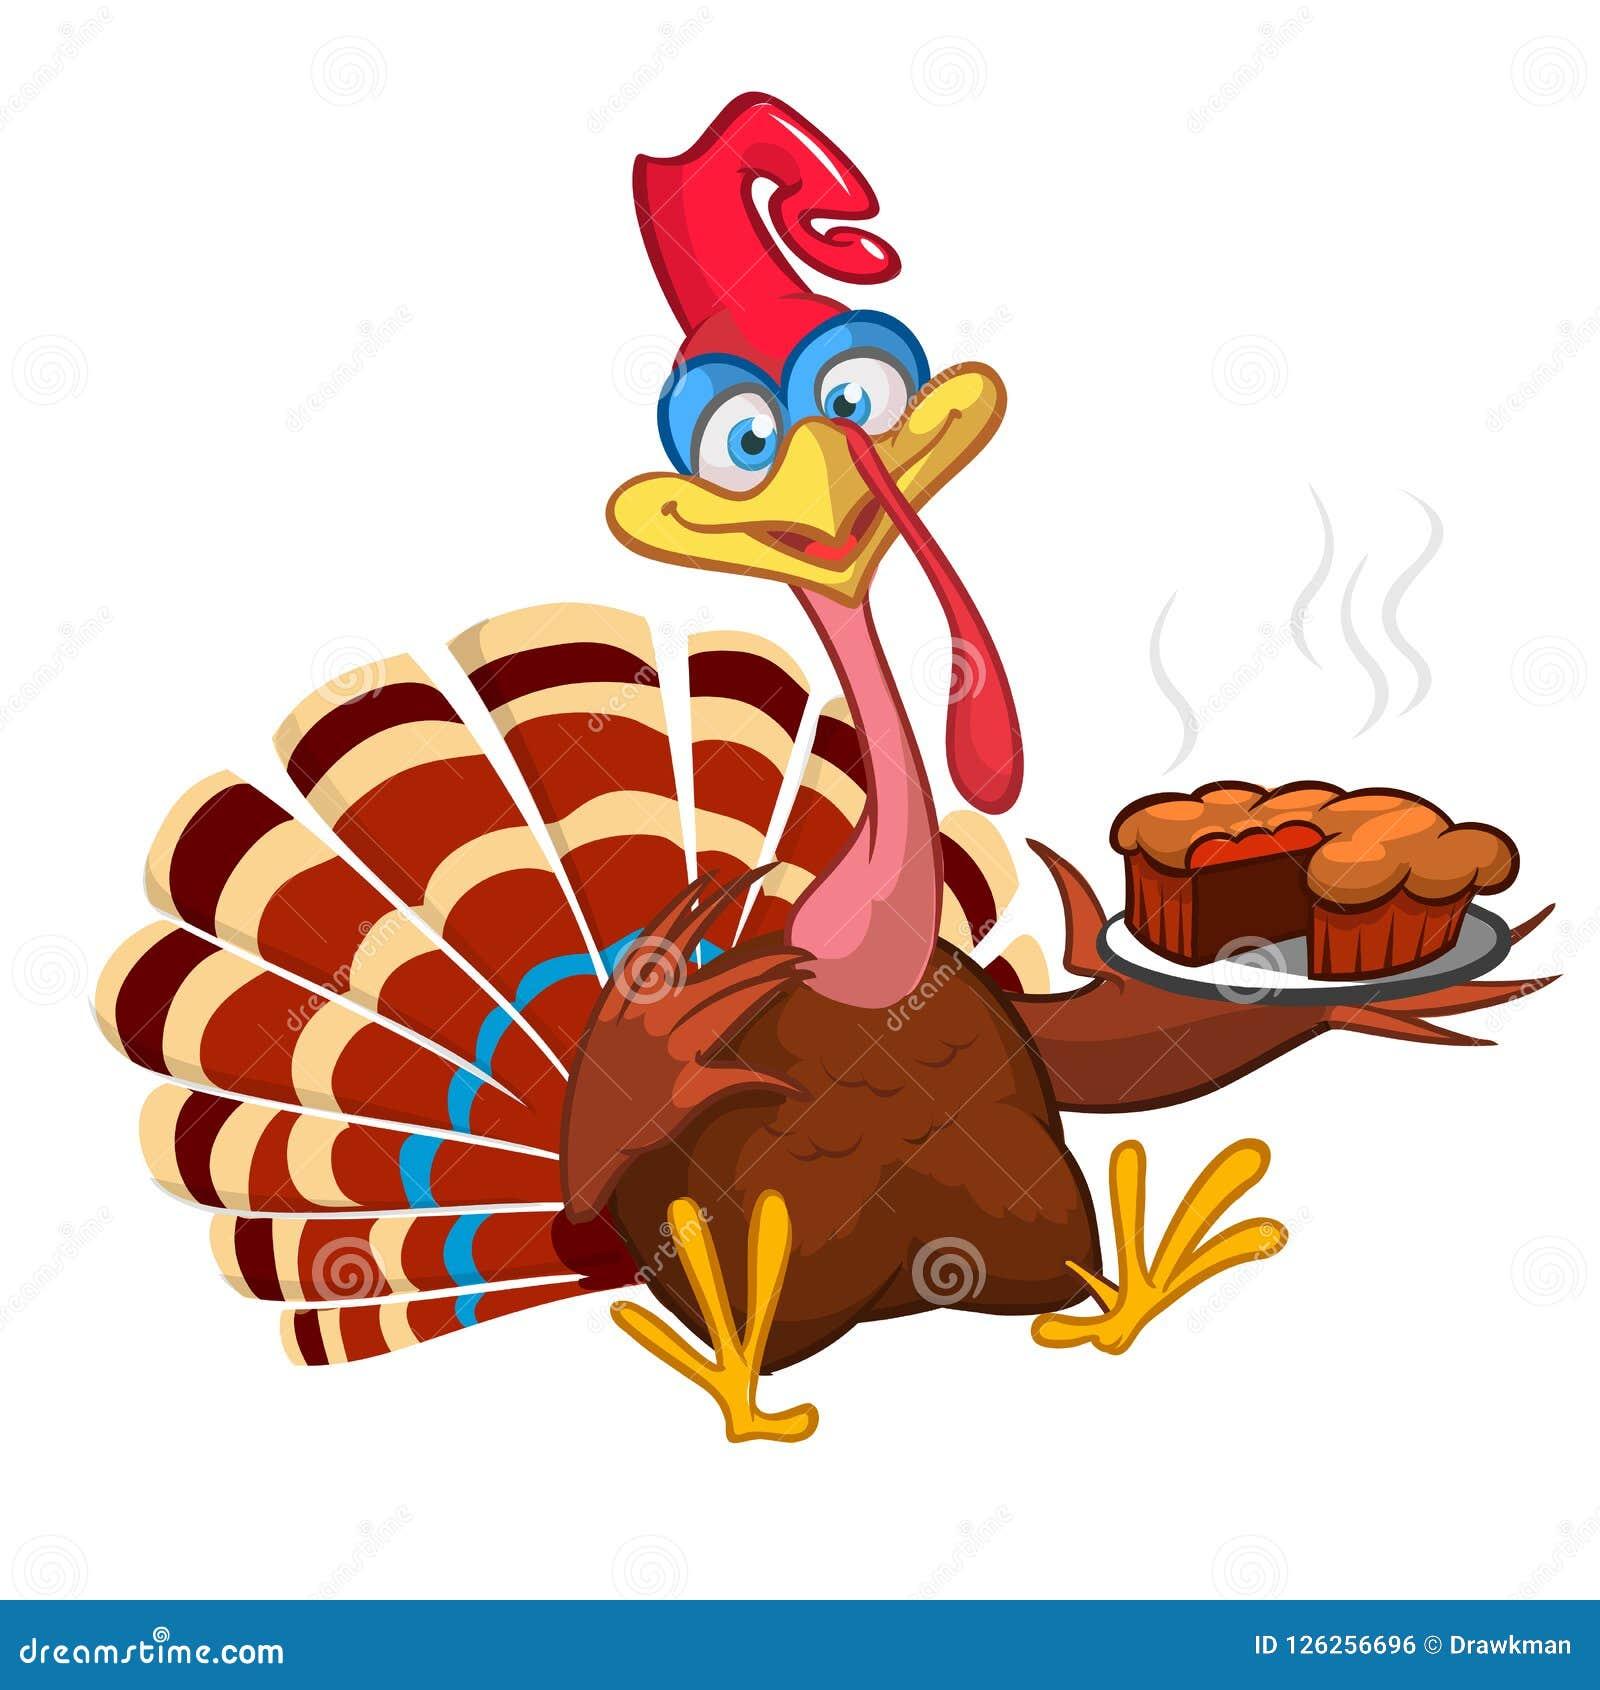 Thanksgiving cartoon turkey bird greeting card vector illustration download thanksgiving cartoon turkey bird greeting card vector illustration of funny turkey character clipart m4hsunfo